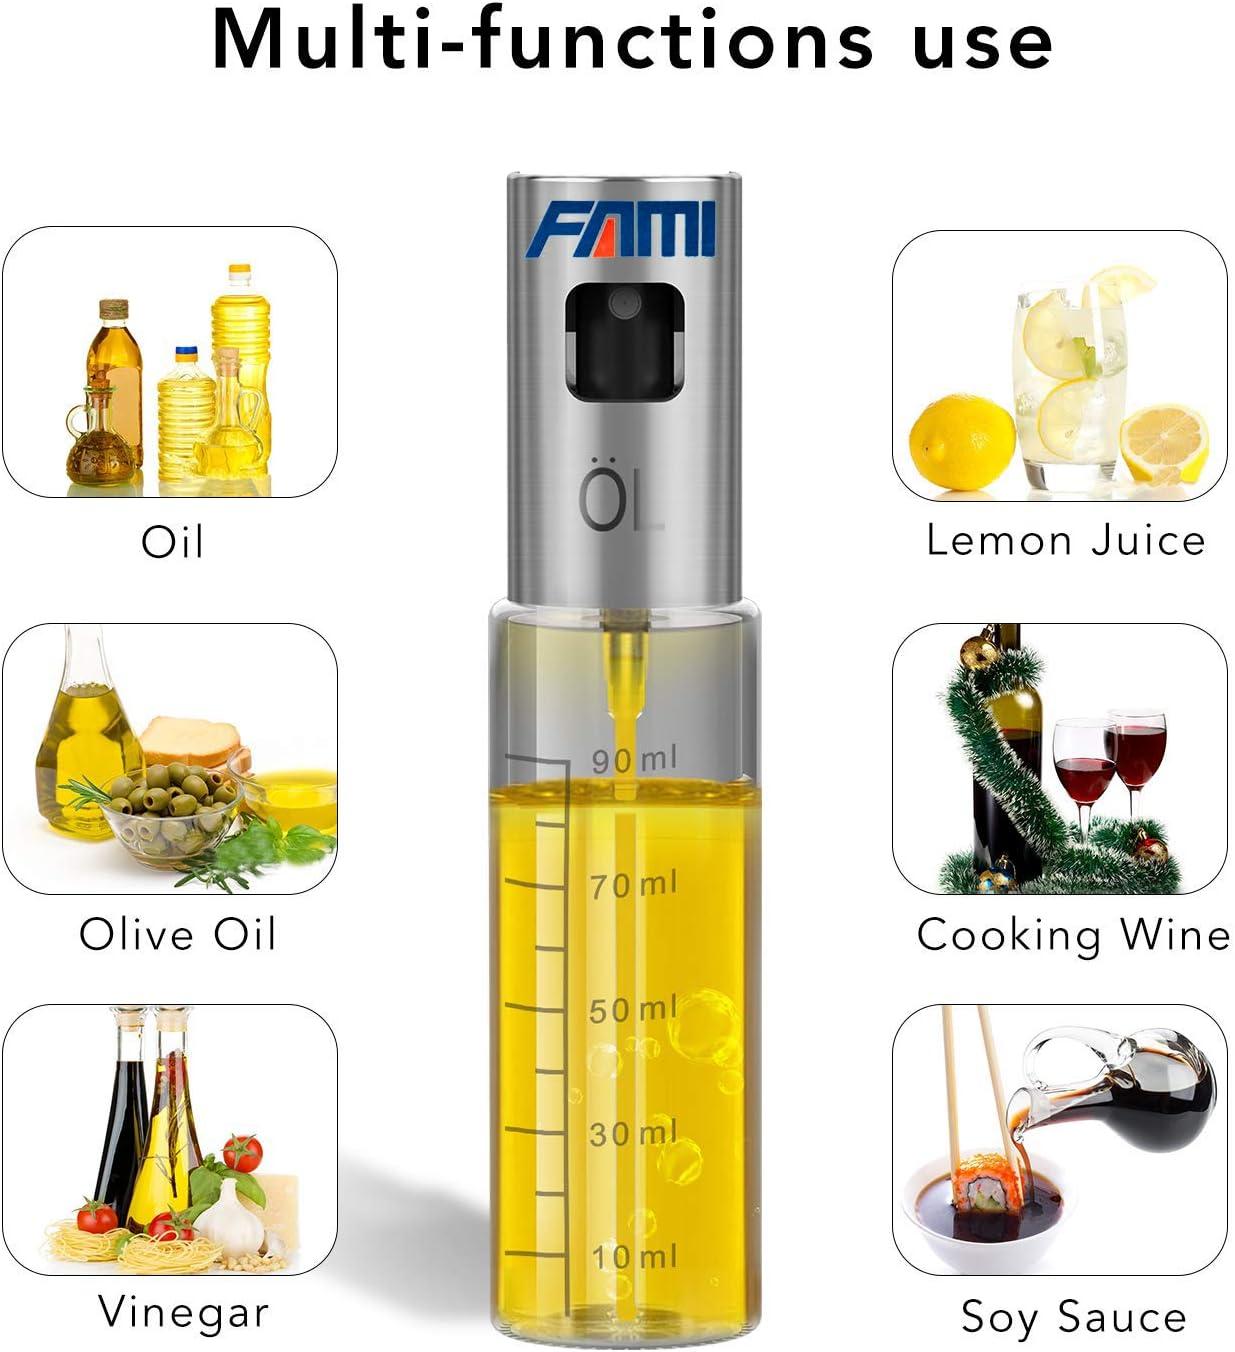 Roasting TIMGOU 3.42 oz Oil Dispenser Glass Bottle to Spray Oil Vinegar Lemon Juice Wine for Cooking Kitchen Baking Oliver Oil Sprayer with BBQ Oil Brush Salad BBQ